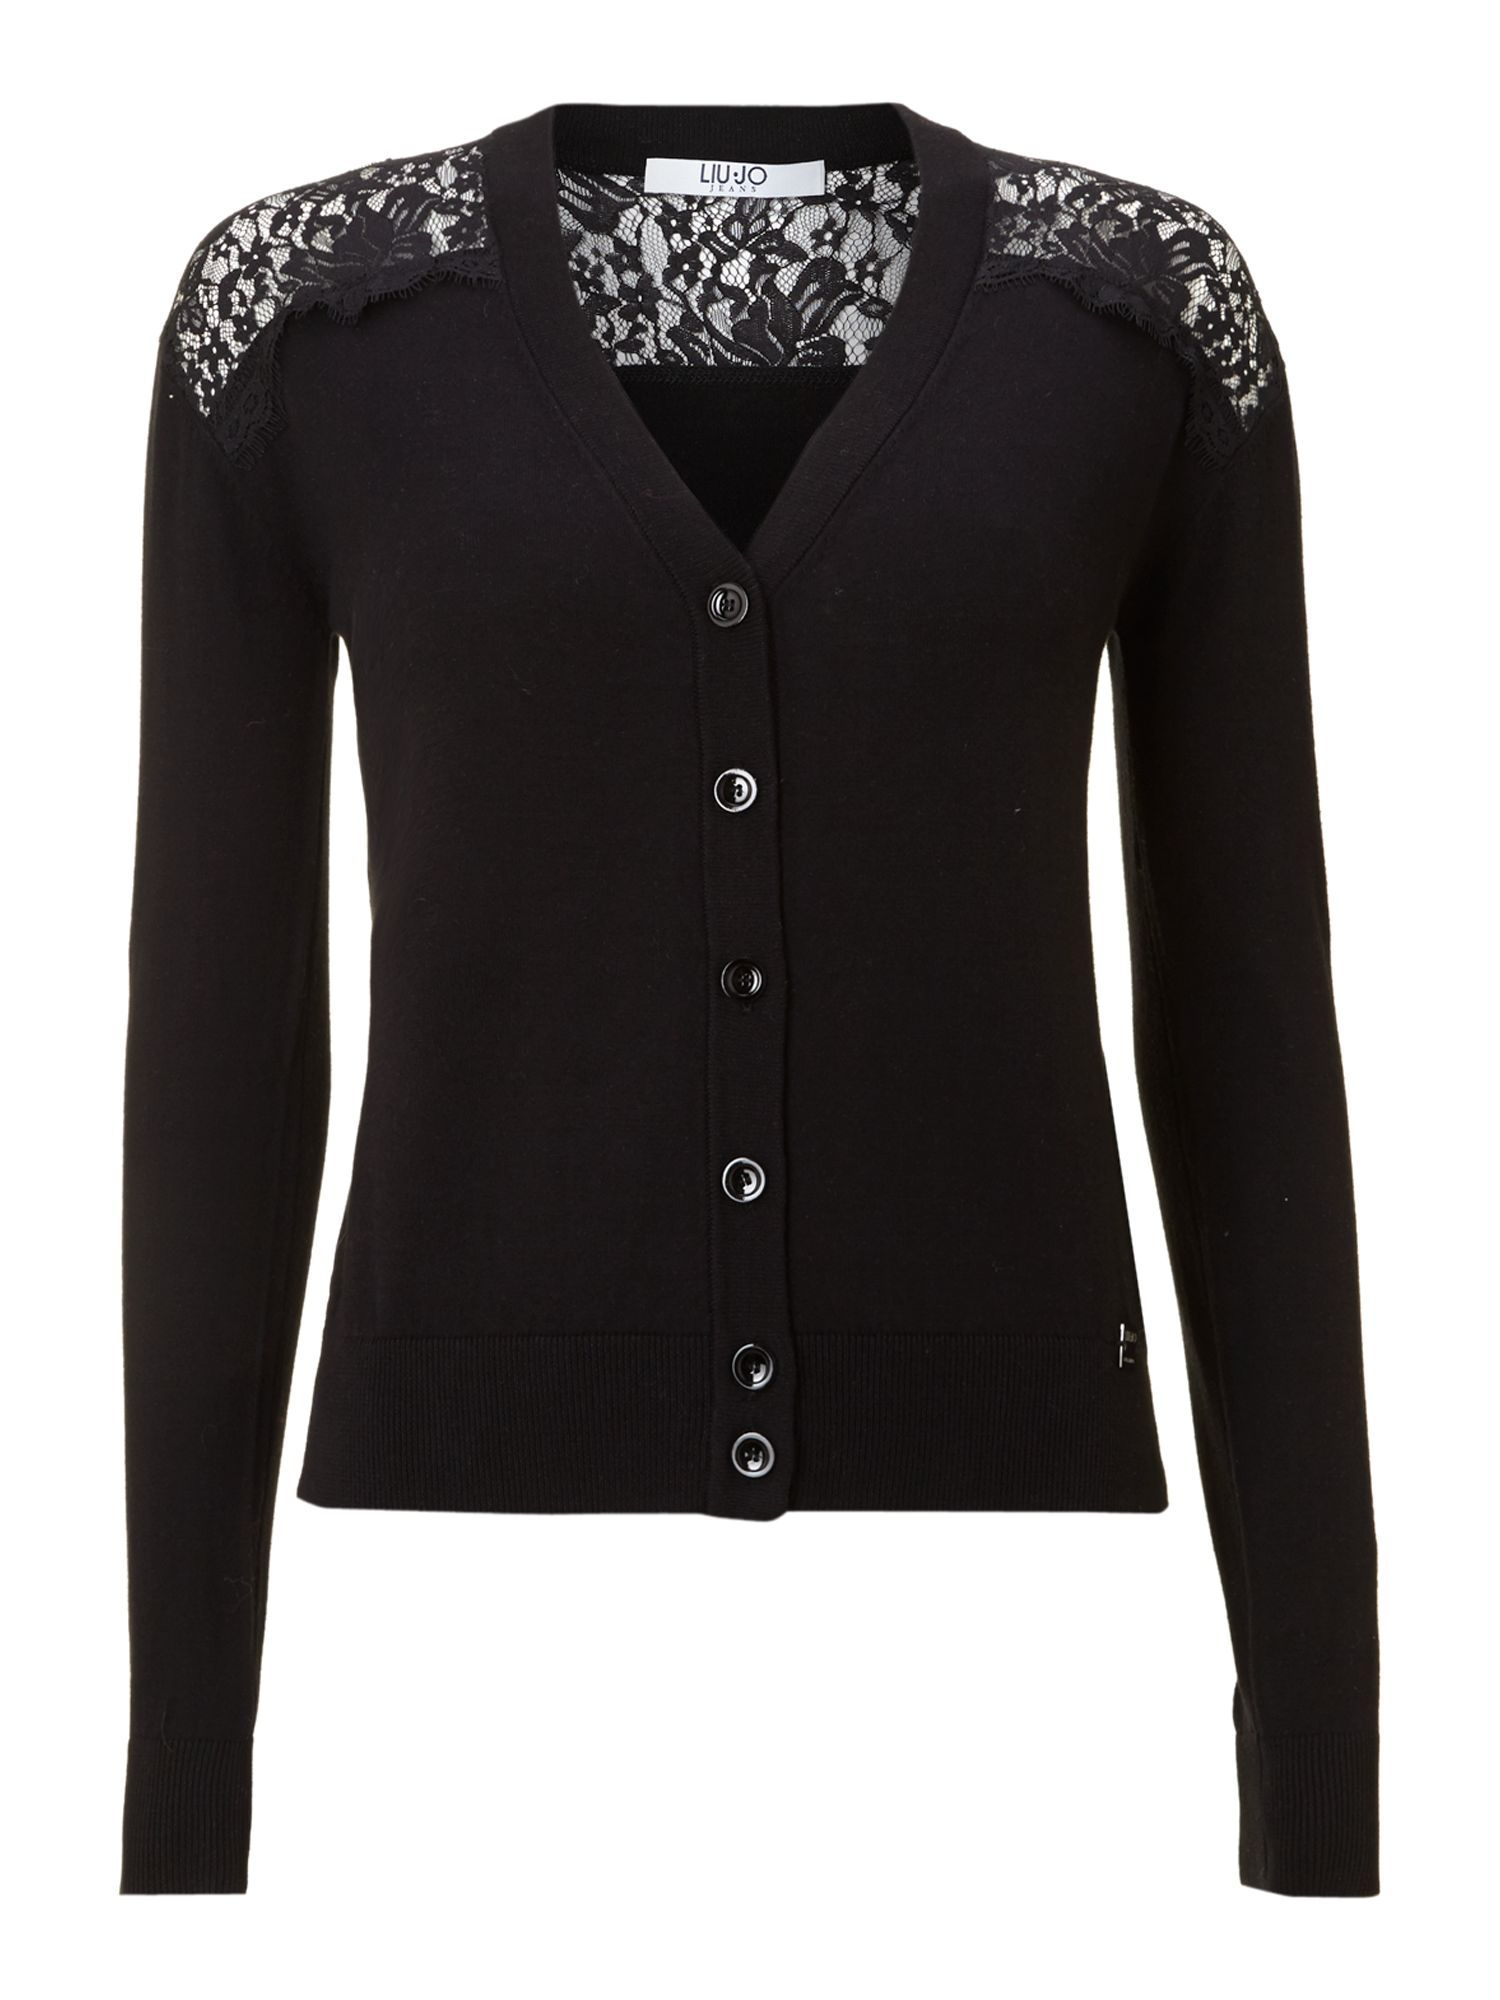 Liu jo Lace Back Button Front Cardigan in Black | Lyst